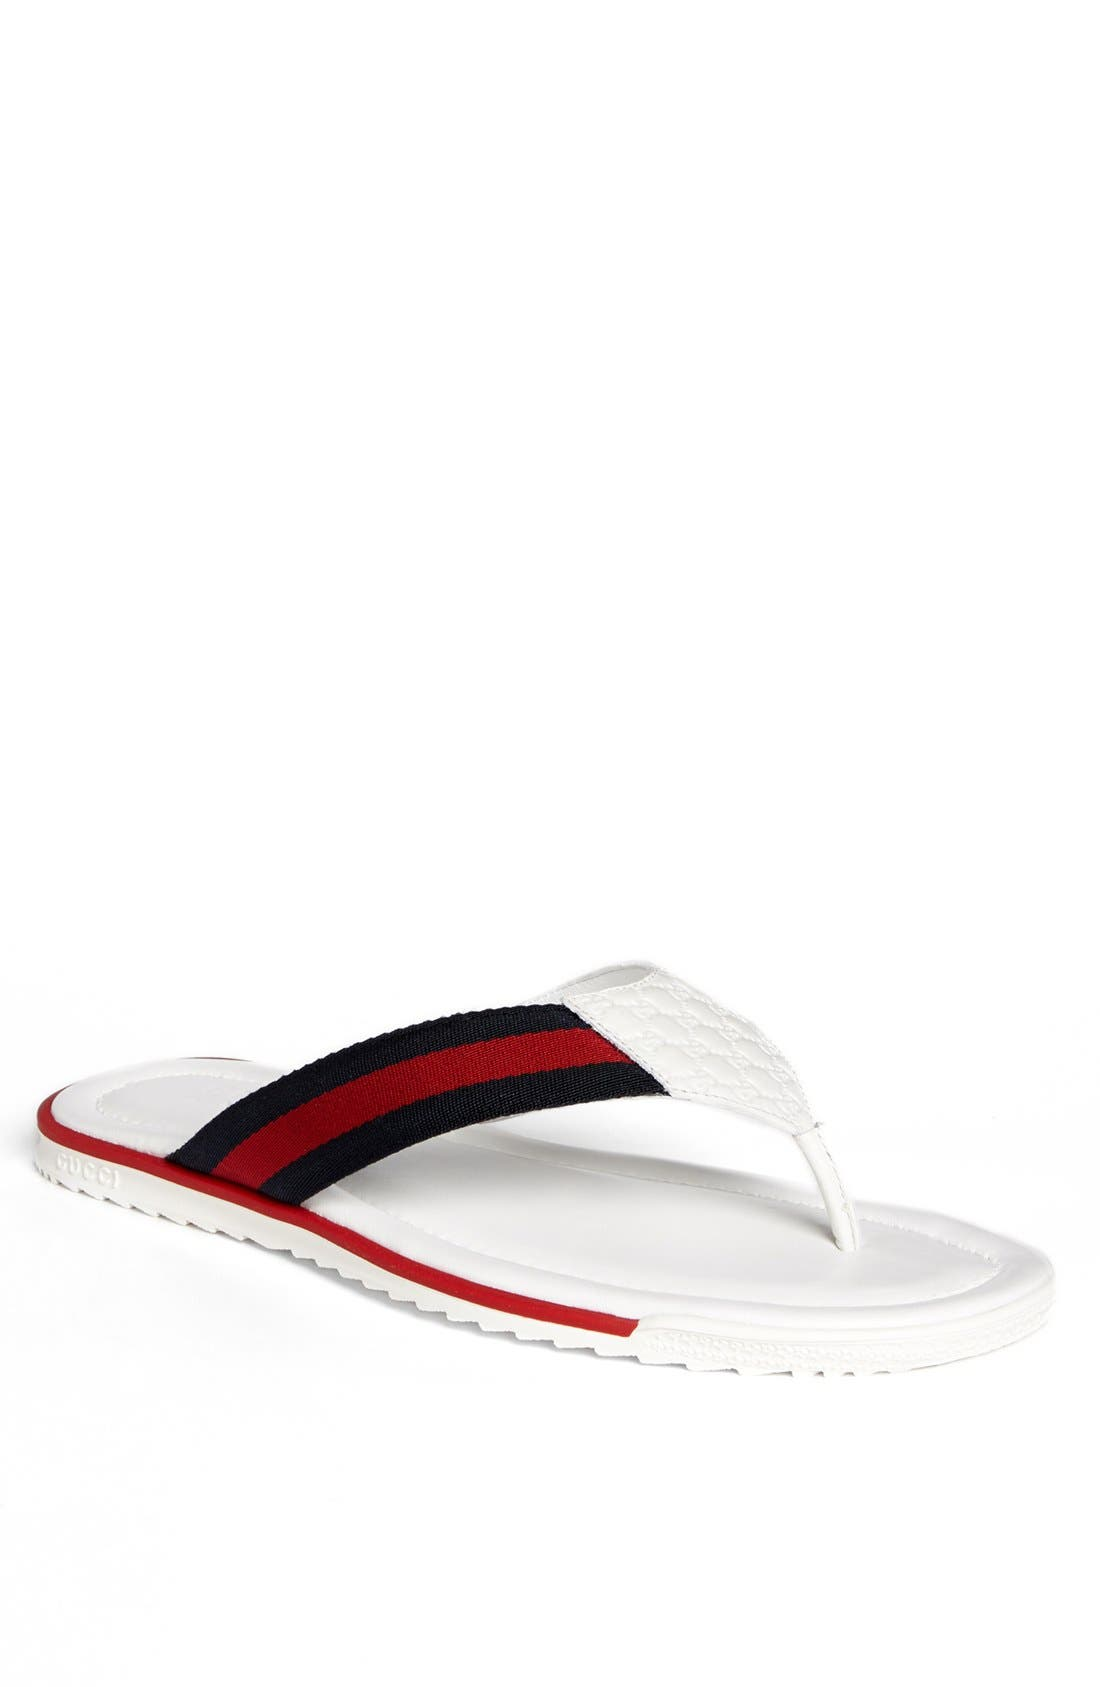 Alternate Image 1 Selected - Gucci 'SL 73 Beach' Flip Flop